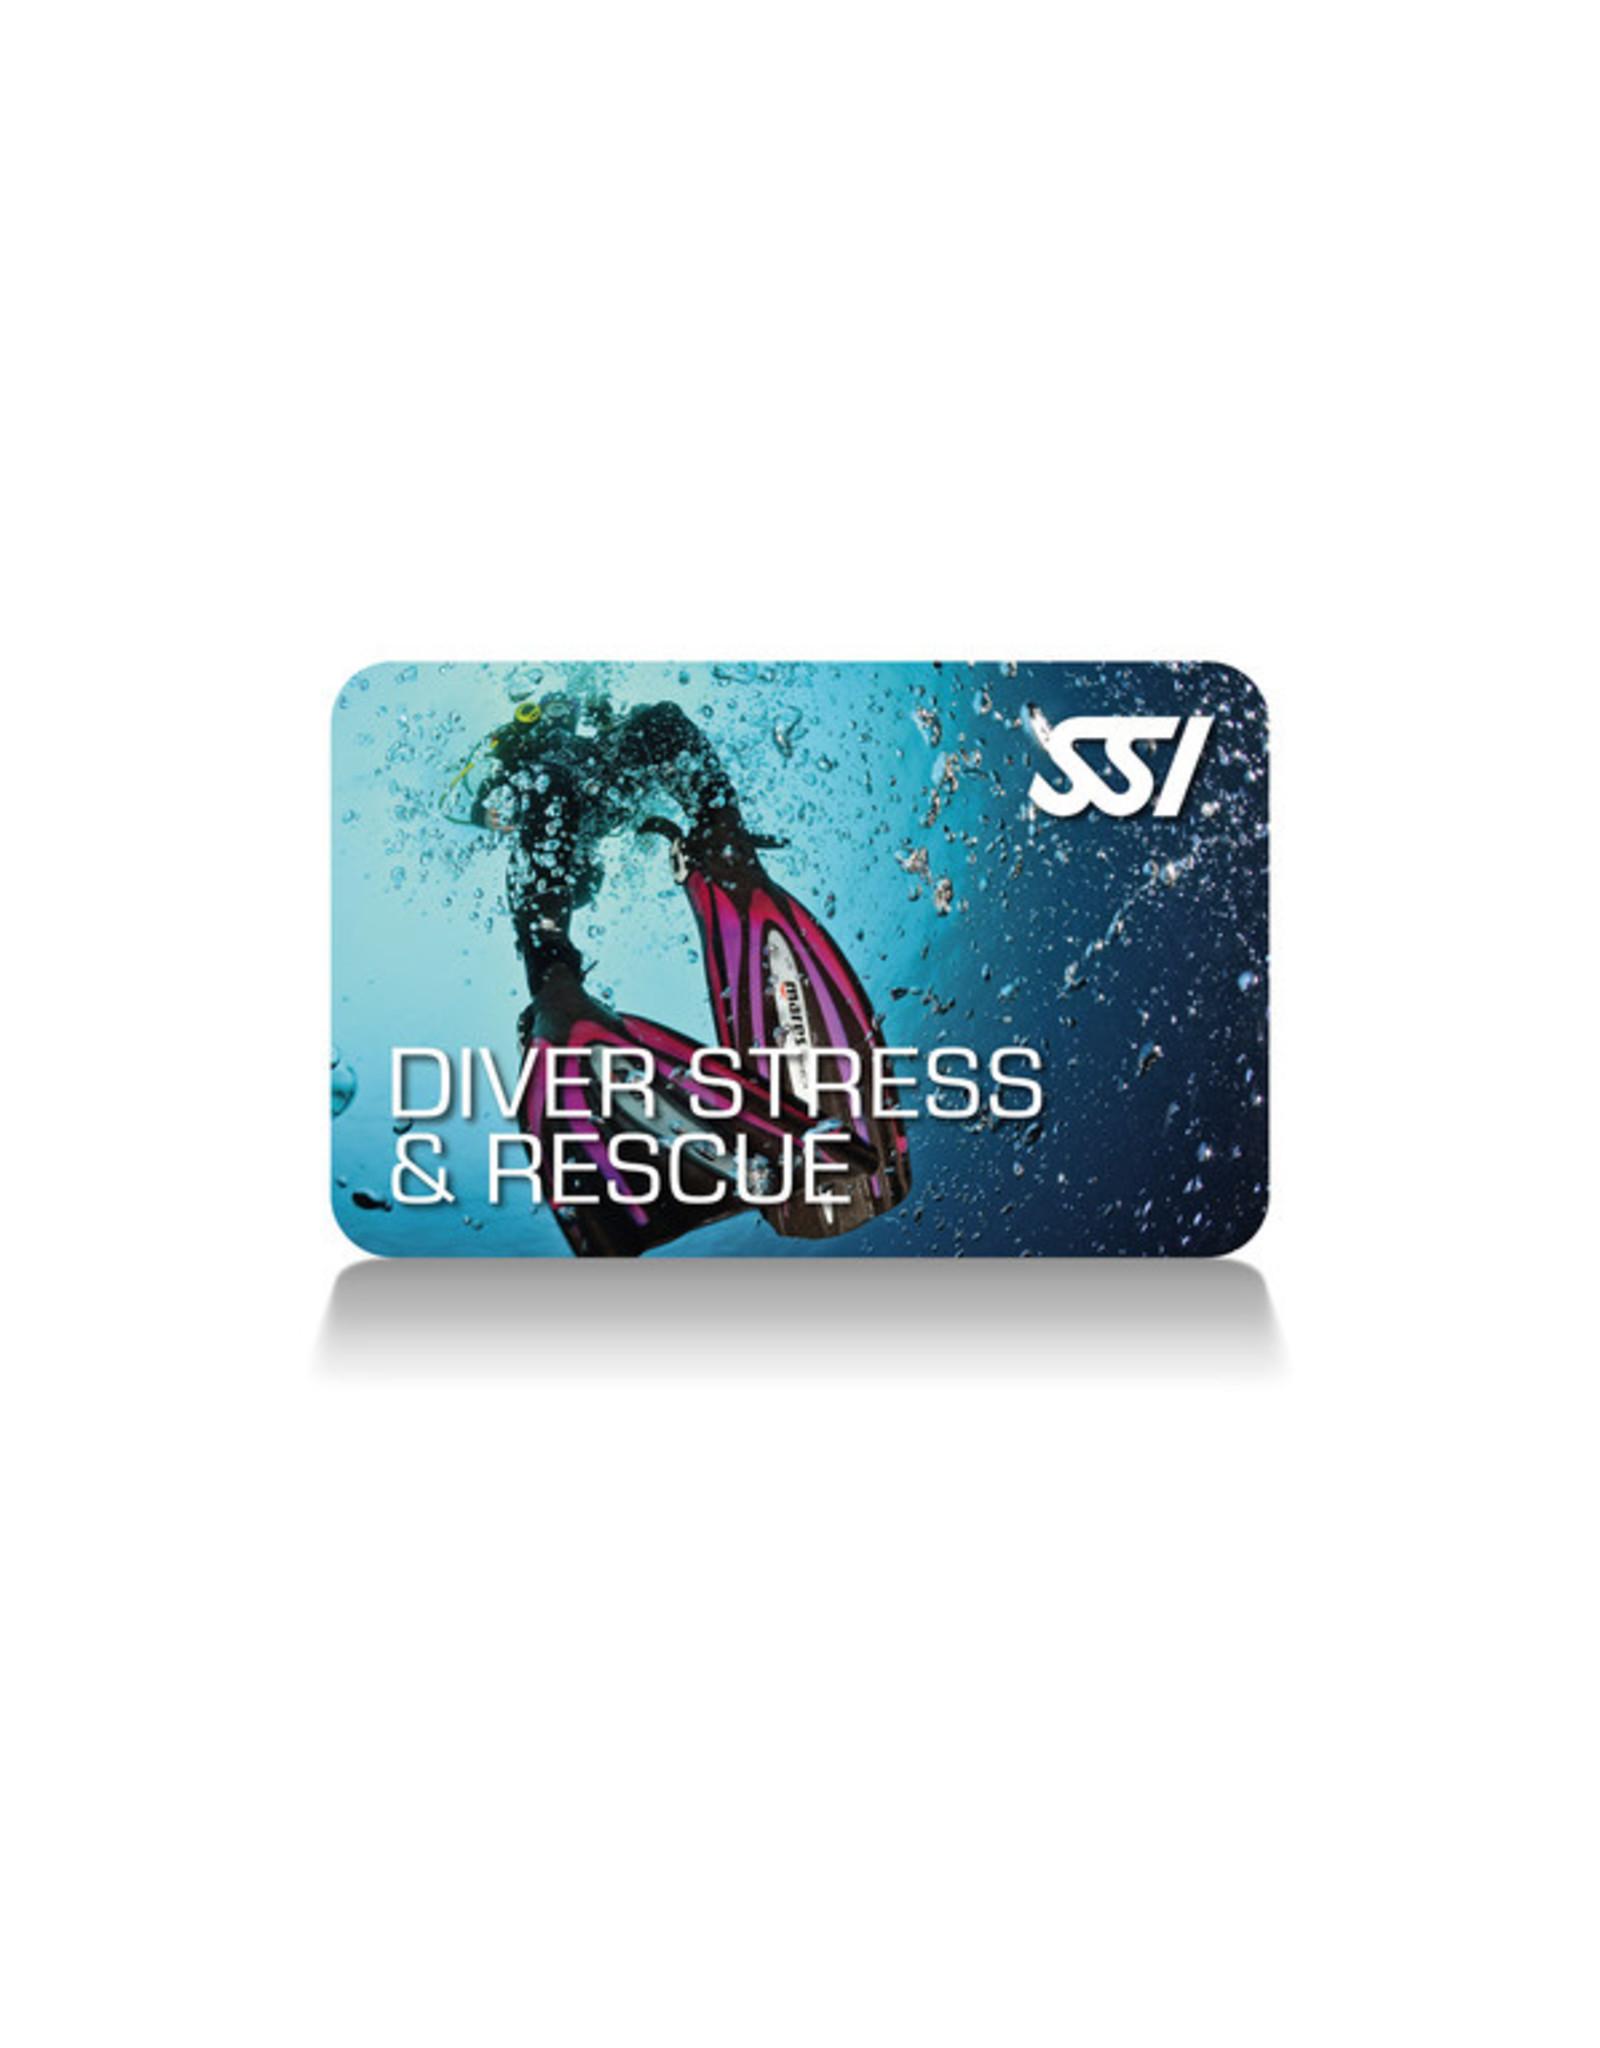 SSI SSI Diver Stress & Rescue